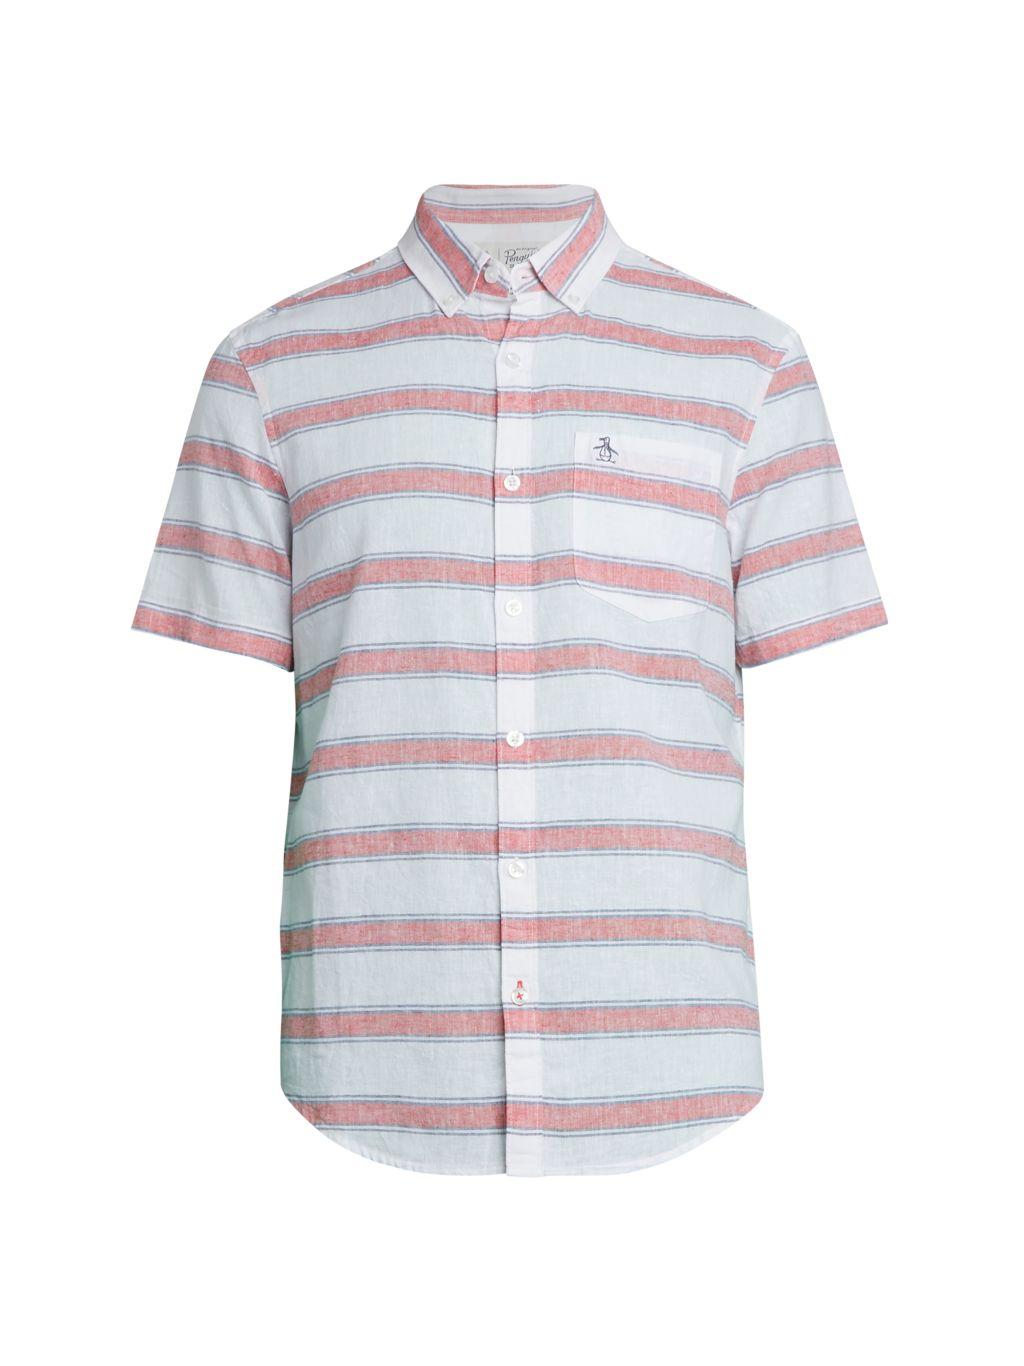 Original Penguin Stripe Linen & Cotton Shirt